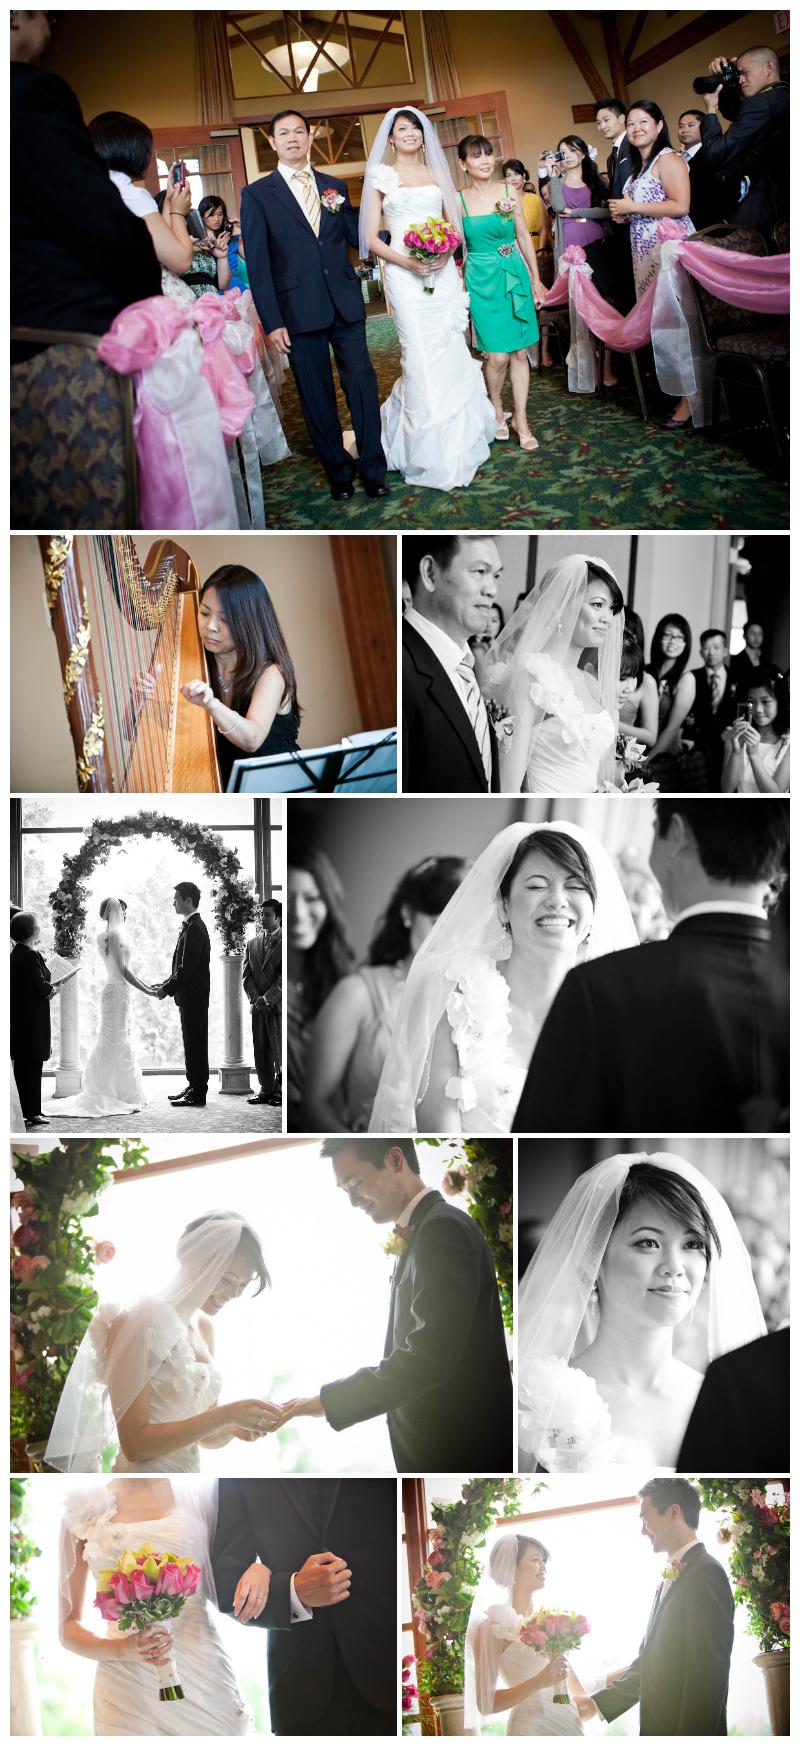 ceremony, westwood plateau, wedding ceremony, coquitlam, indoor, golf course, harp, vows, wedding photos, wedding photography